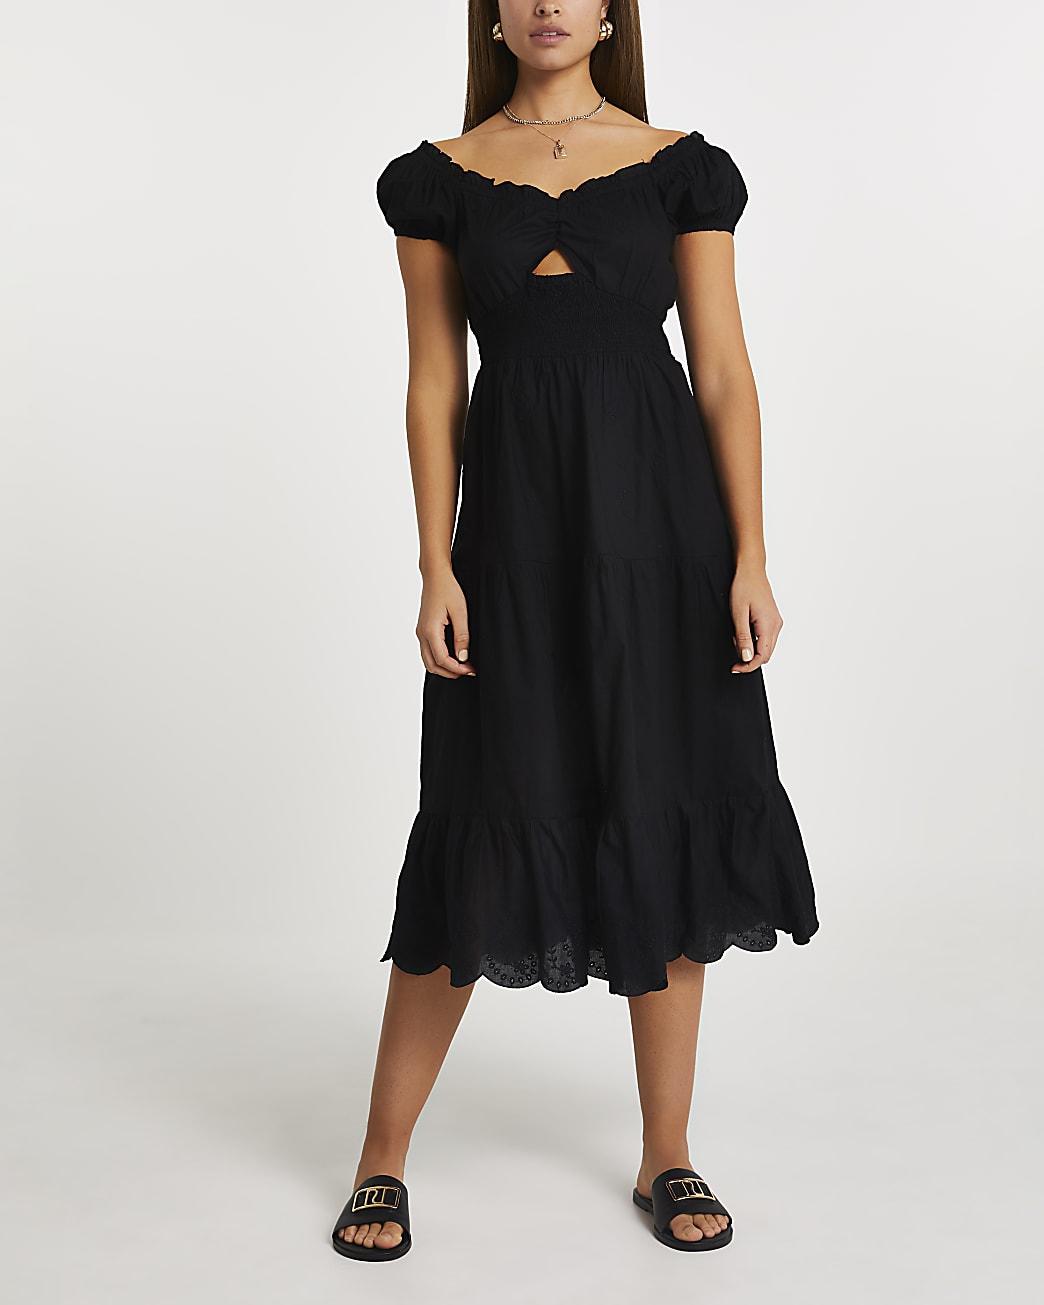 Black short sleeve midi dress